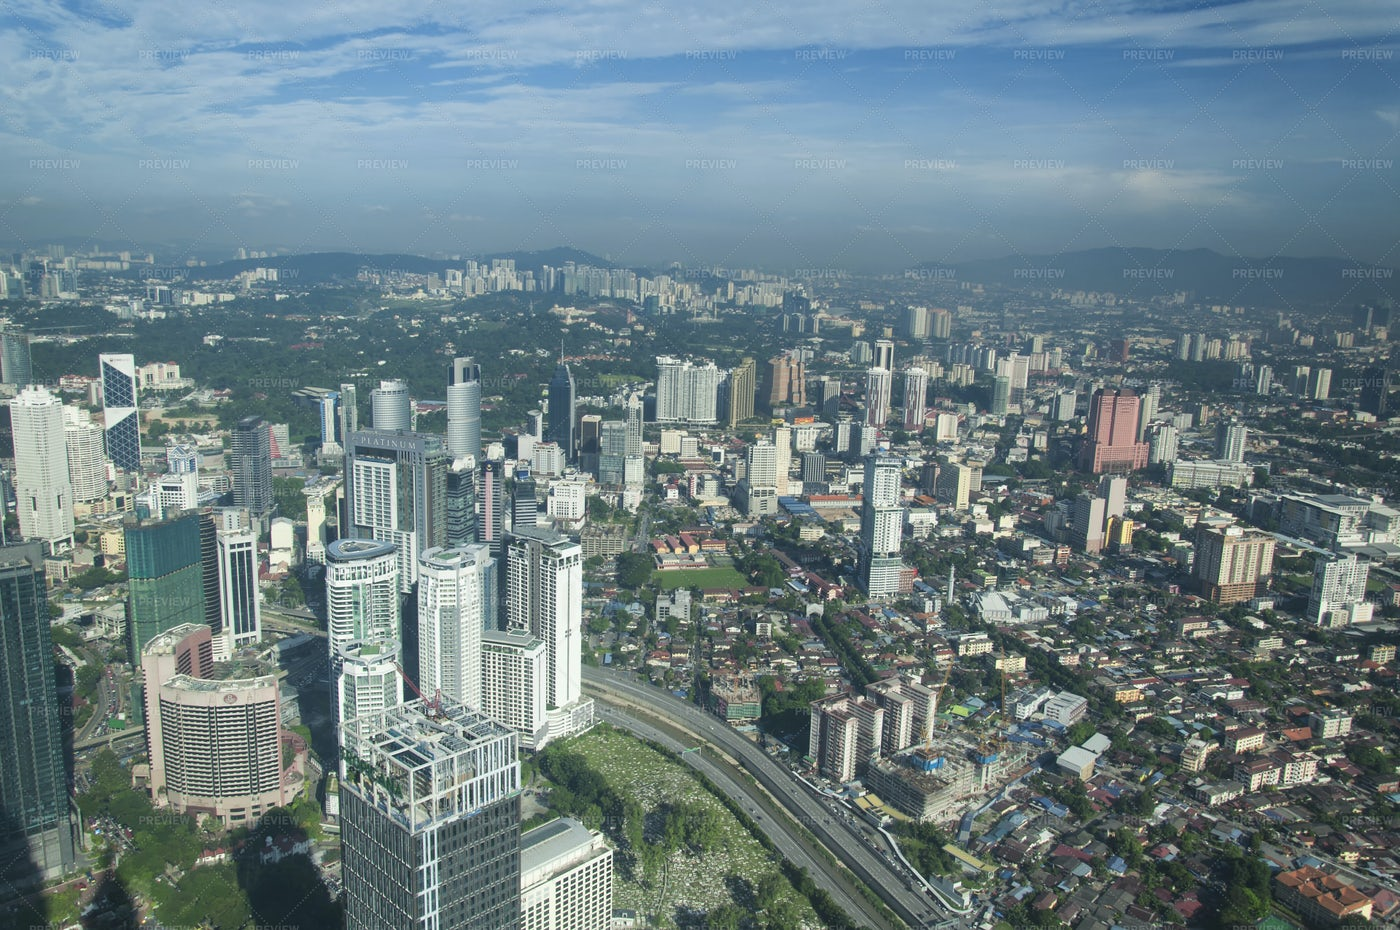 Kuala Lumpur Modern City Skyline: Stock Photos